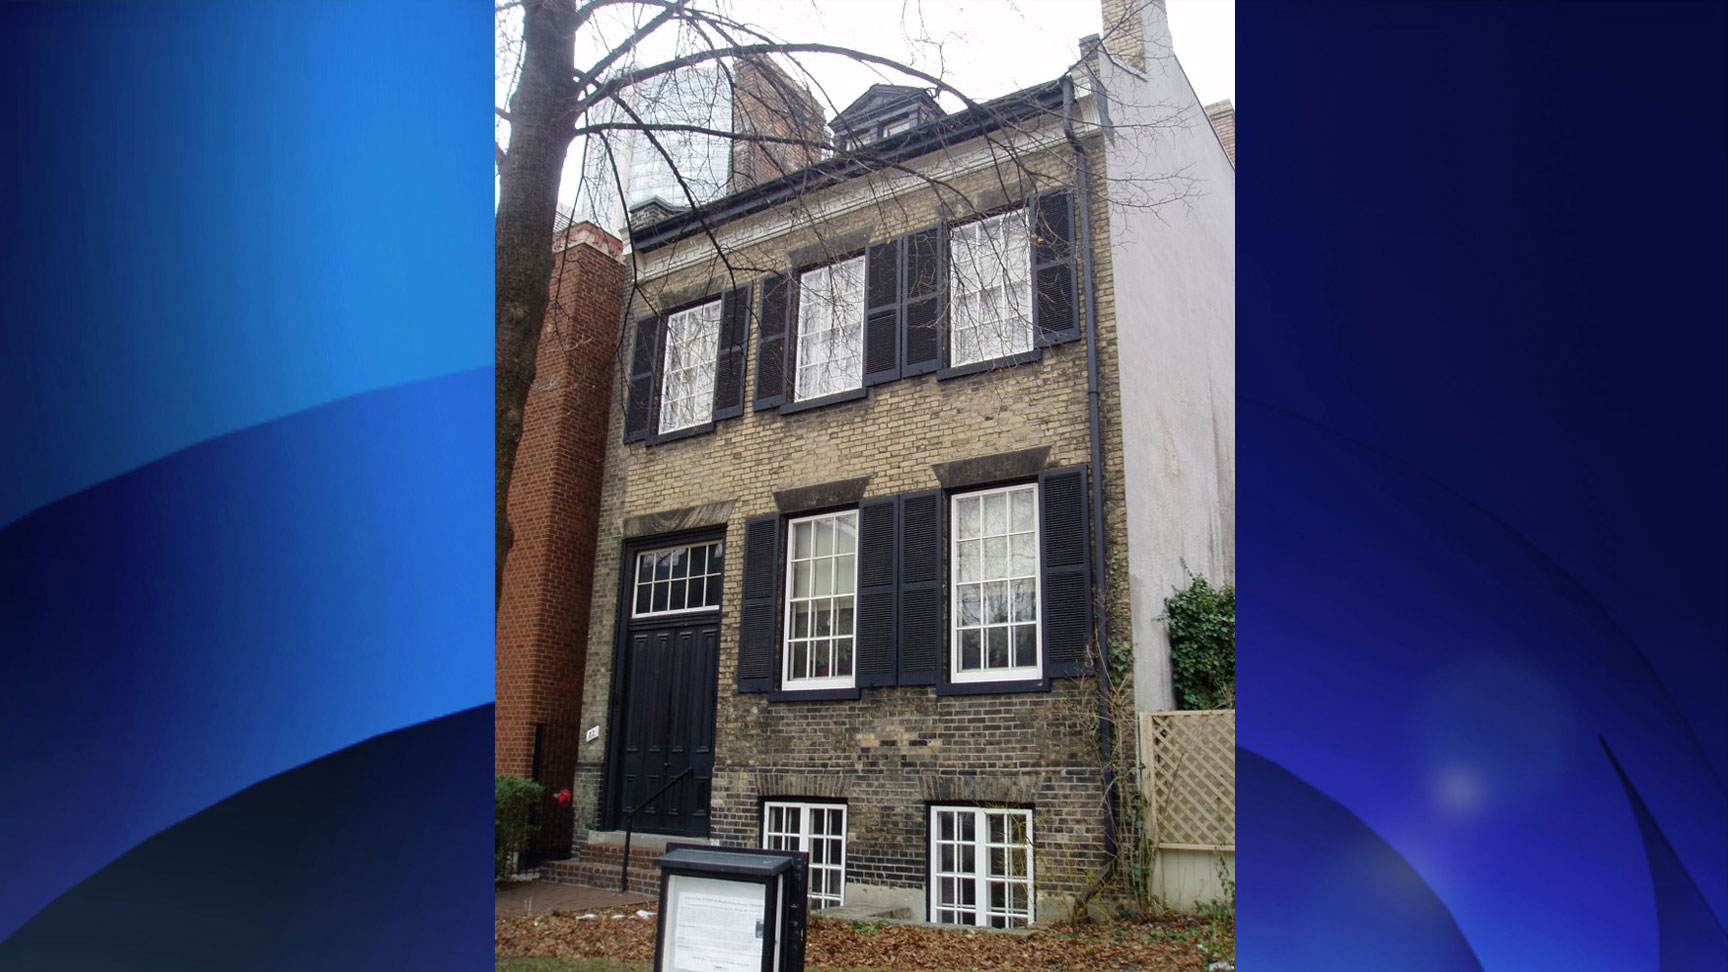 The Mackenzie House on Bond Street in Toronto. CREATIVE COMMONS/SimonP.